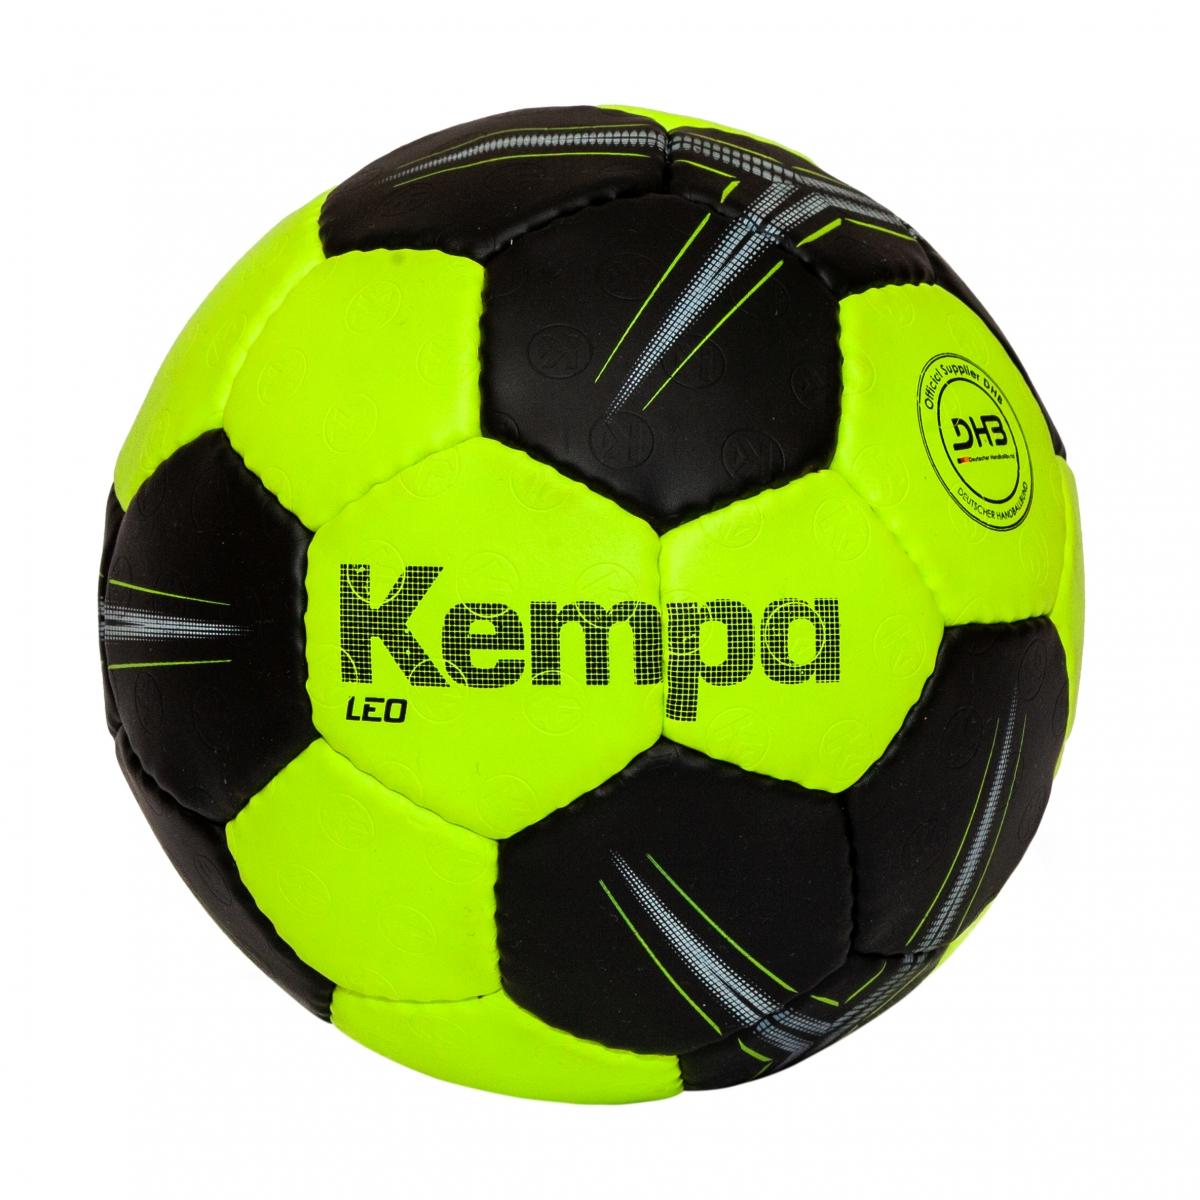 Minge kempa de handbal leo 2019 albastru vernil 0-3